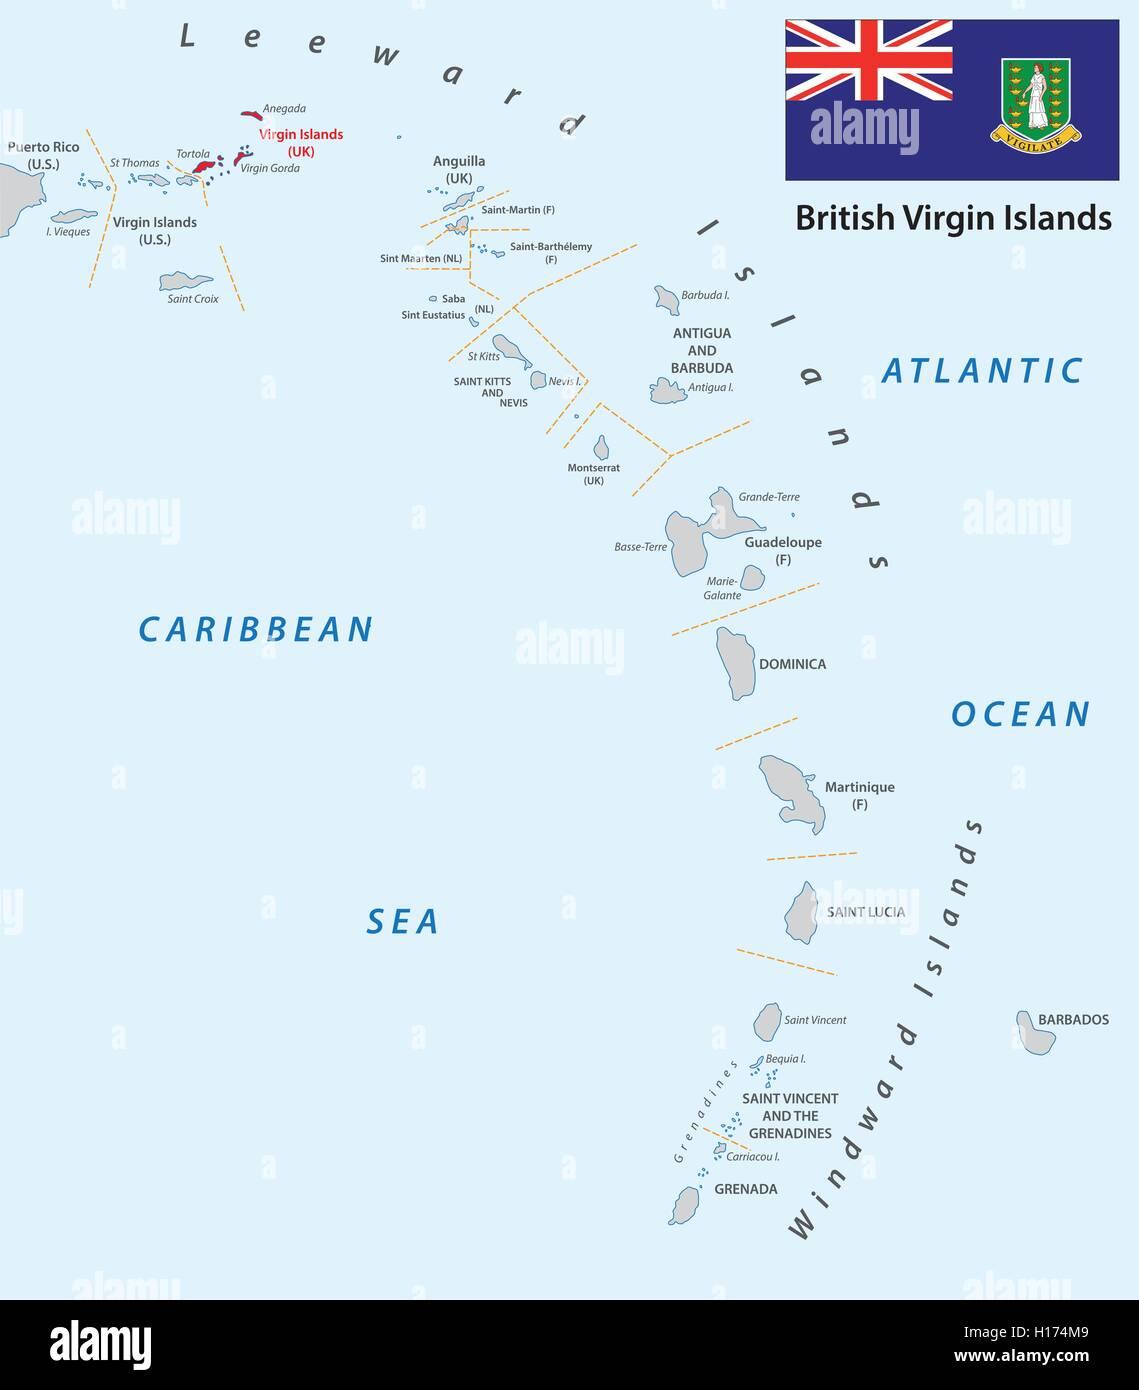 Lesser Antilles Map Stock Photos & Lesser Antilles Map Stock ...